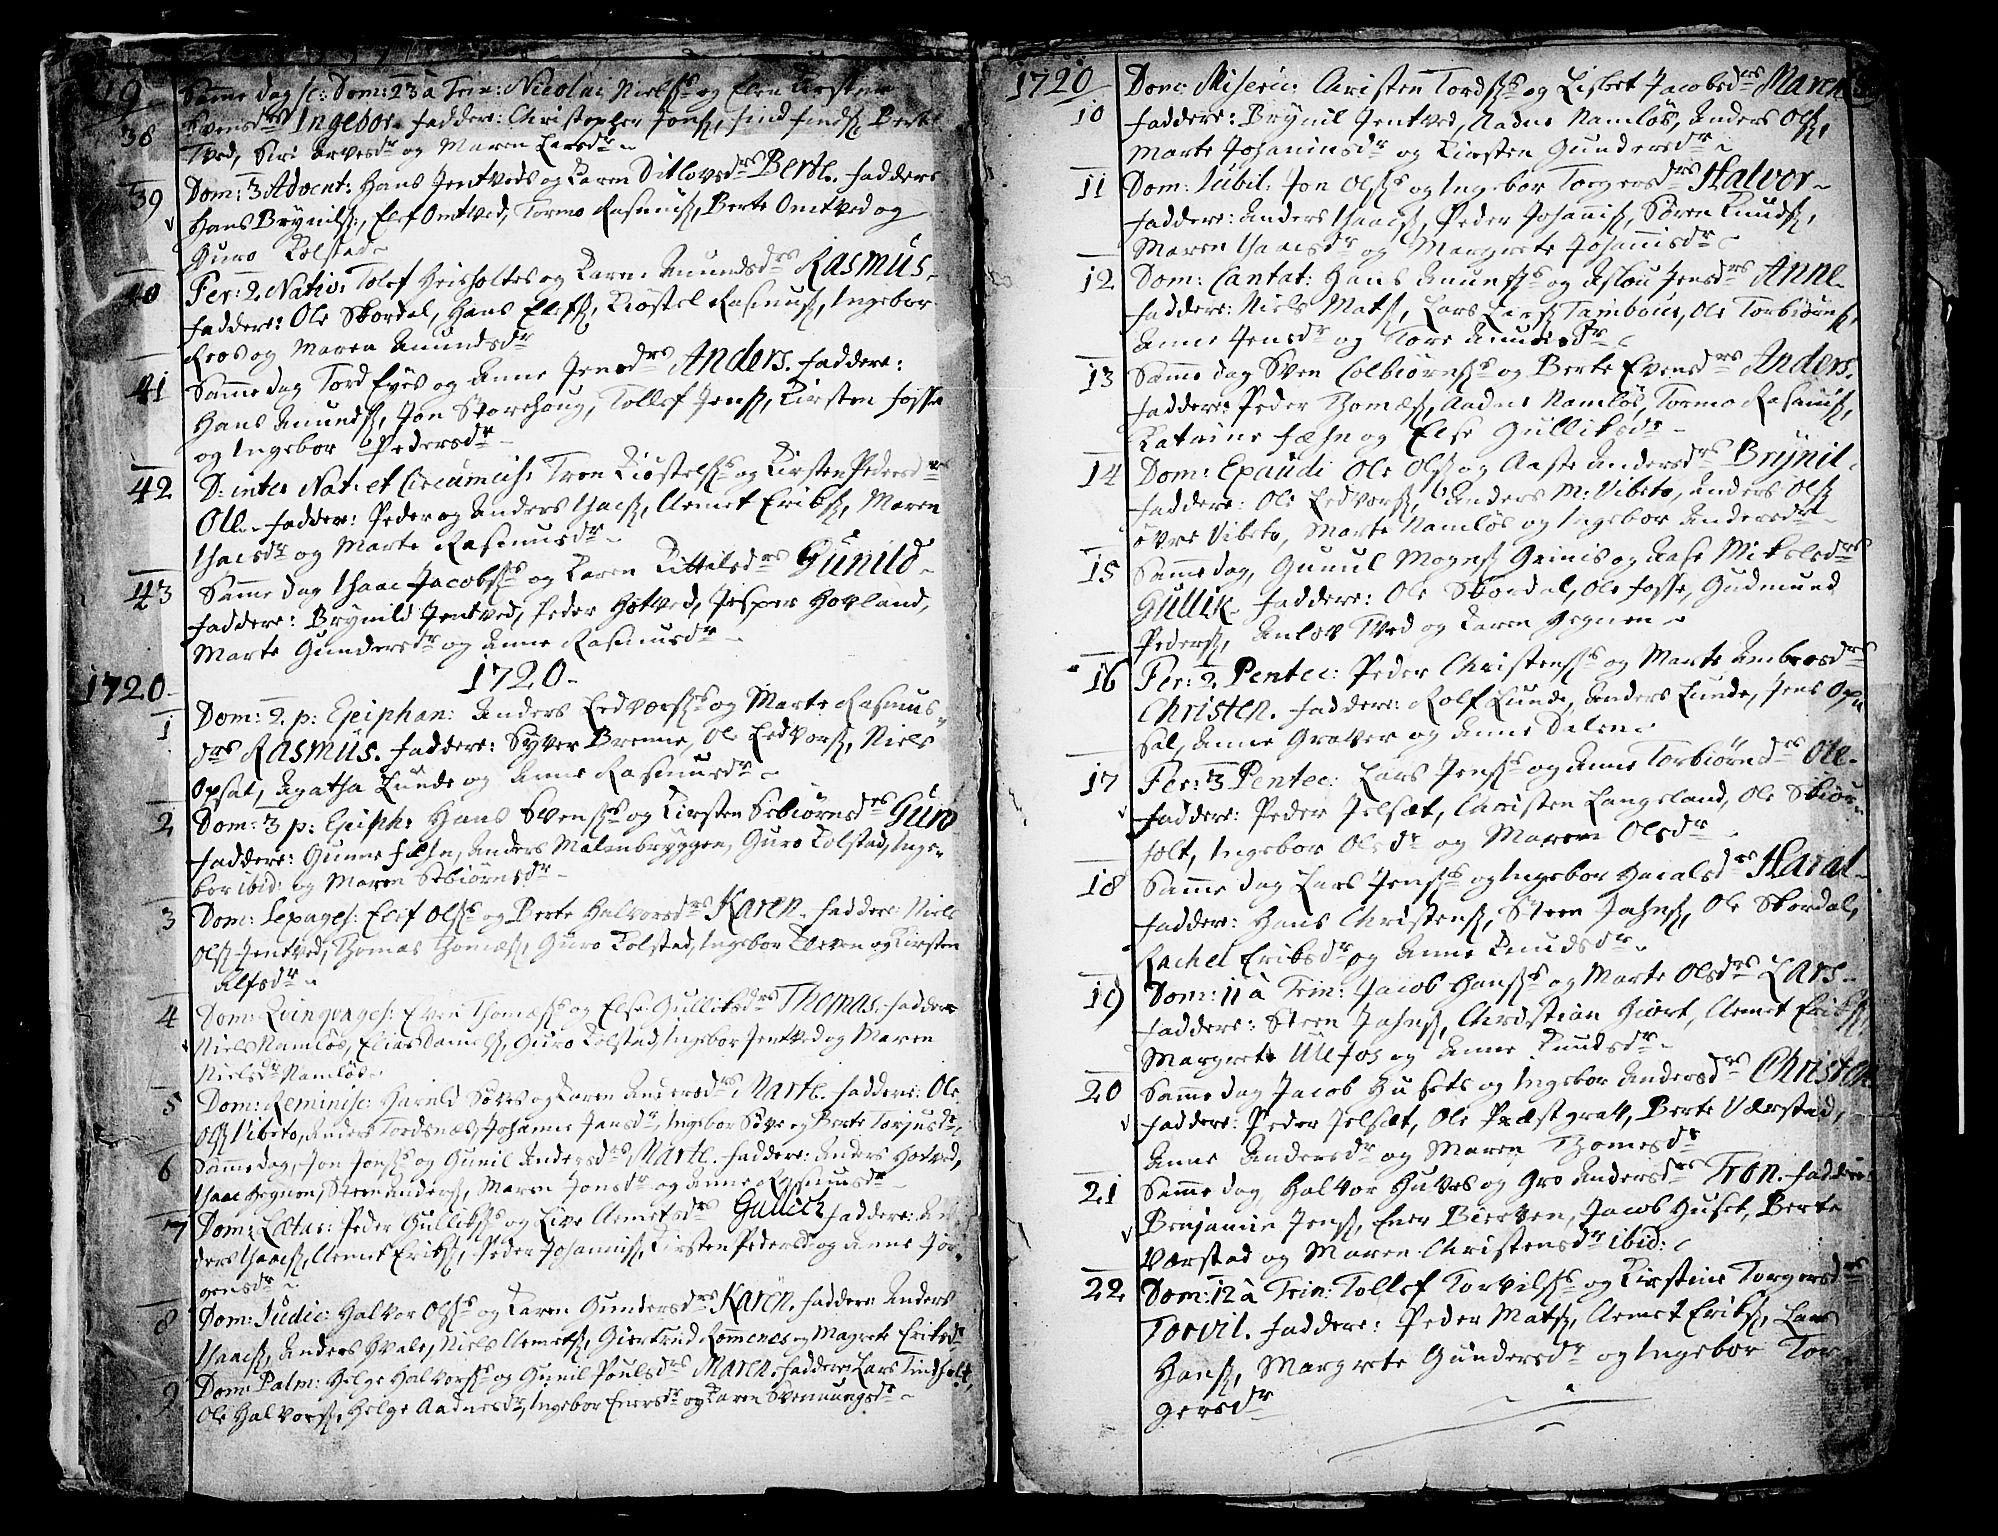 SAKO, Holla kirkebøker, F/Fa/L0001: Ministerialbok nr. 1, 1717-1779, s. 5